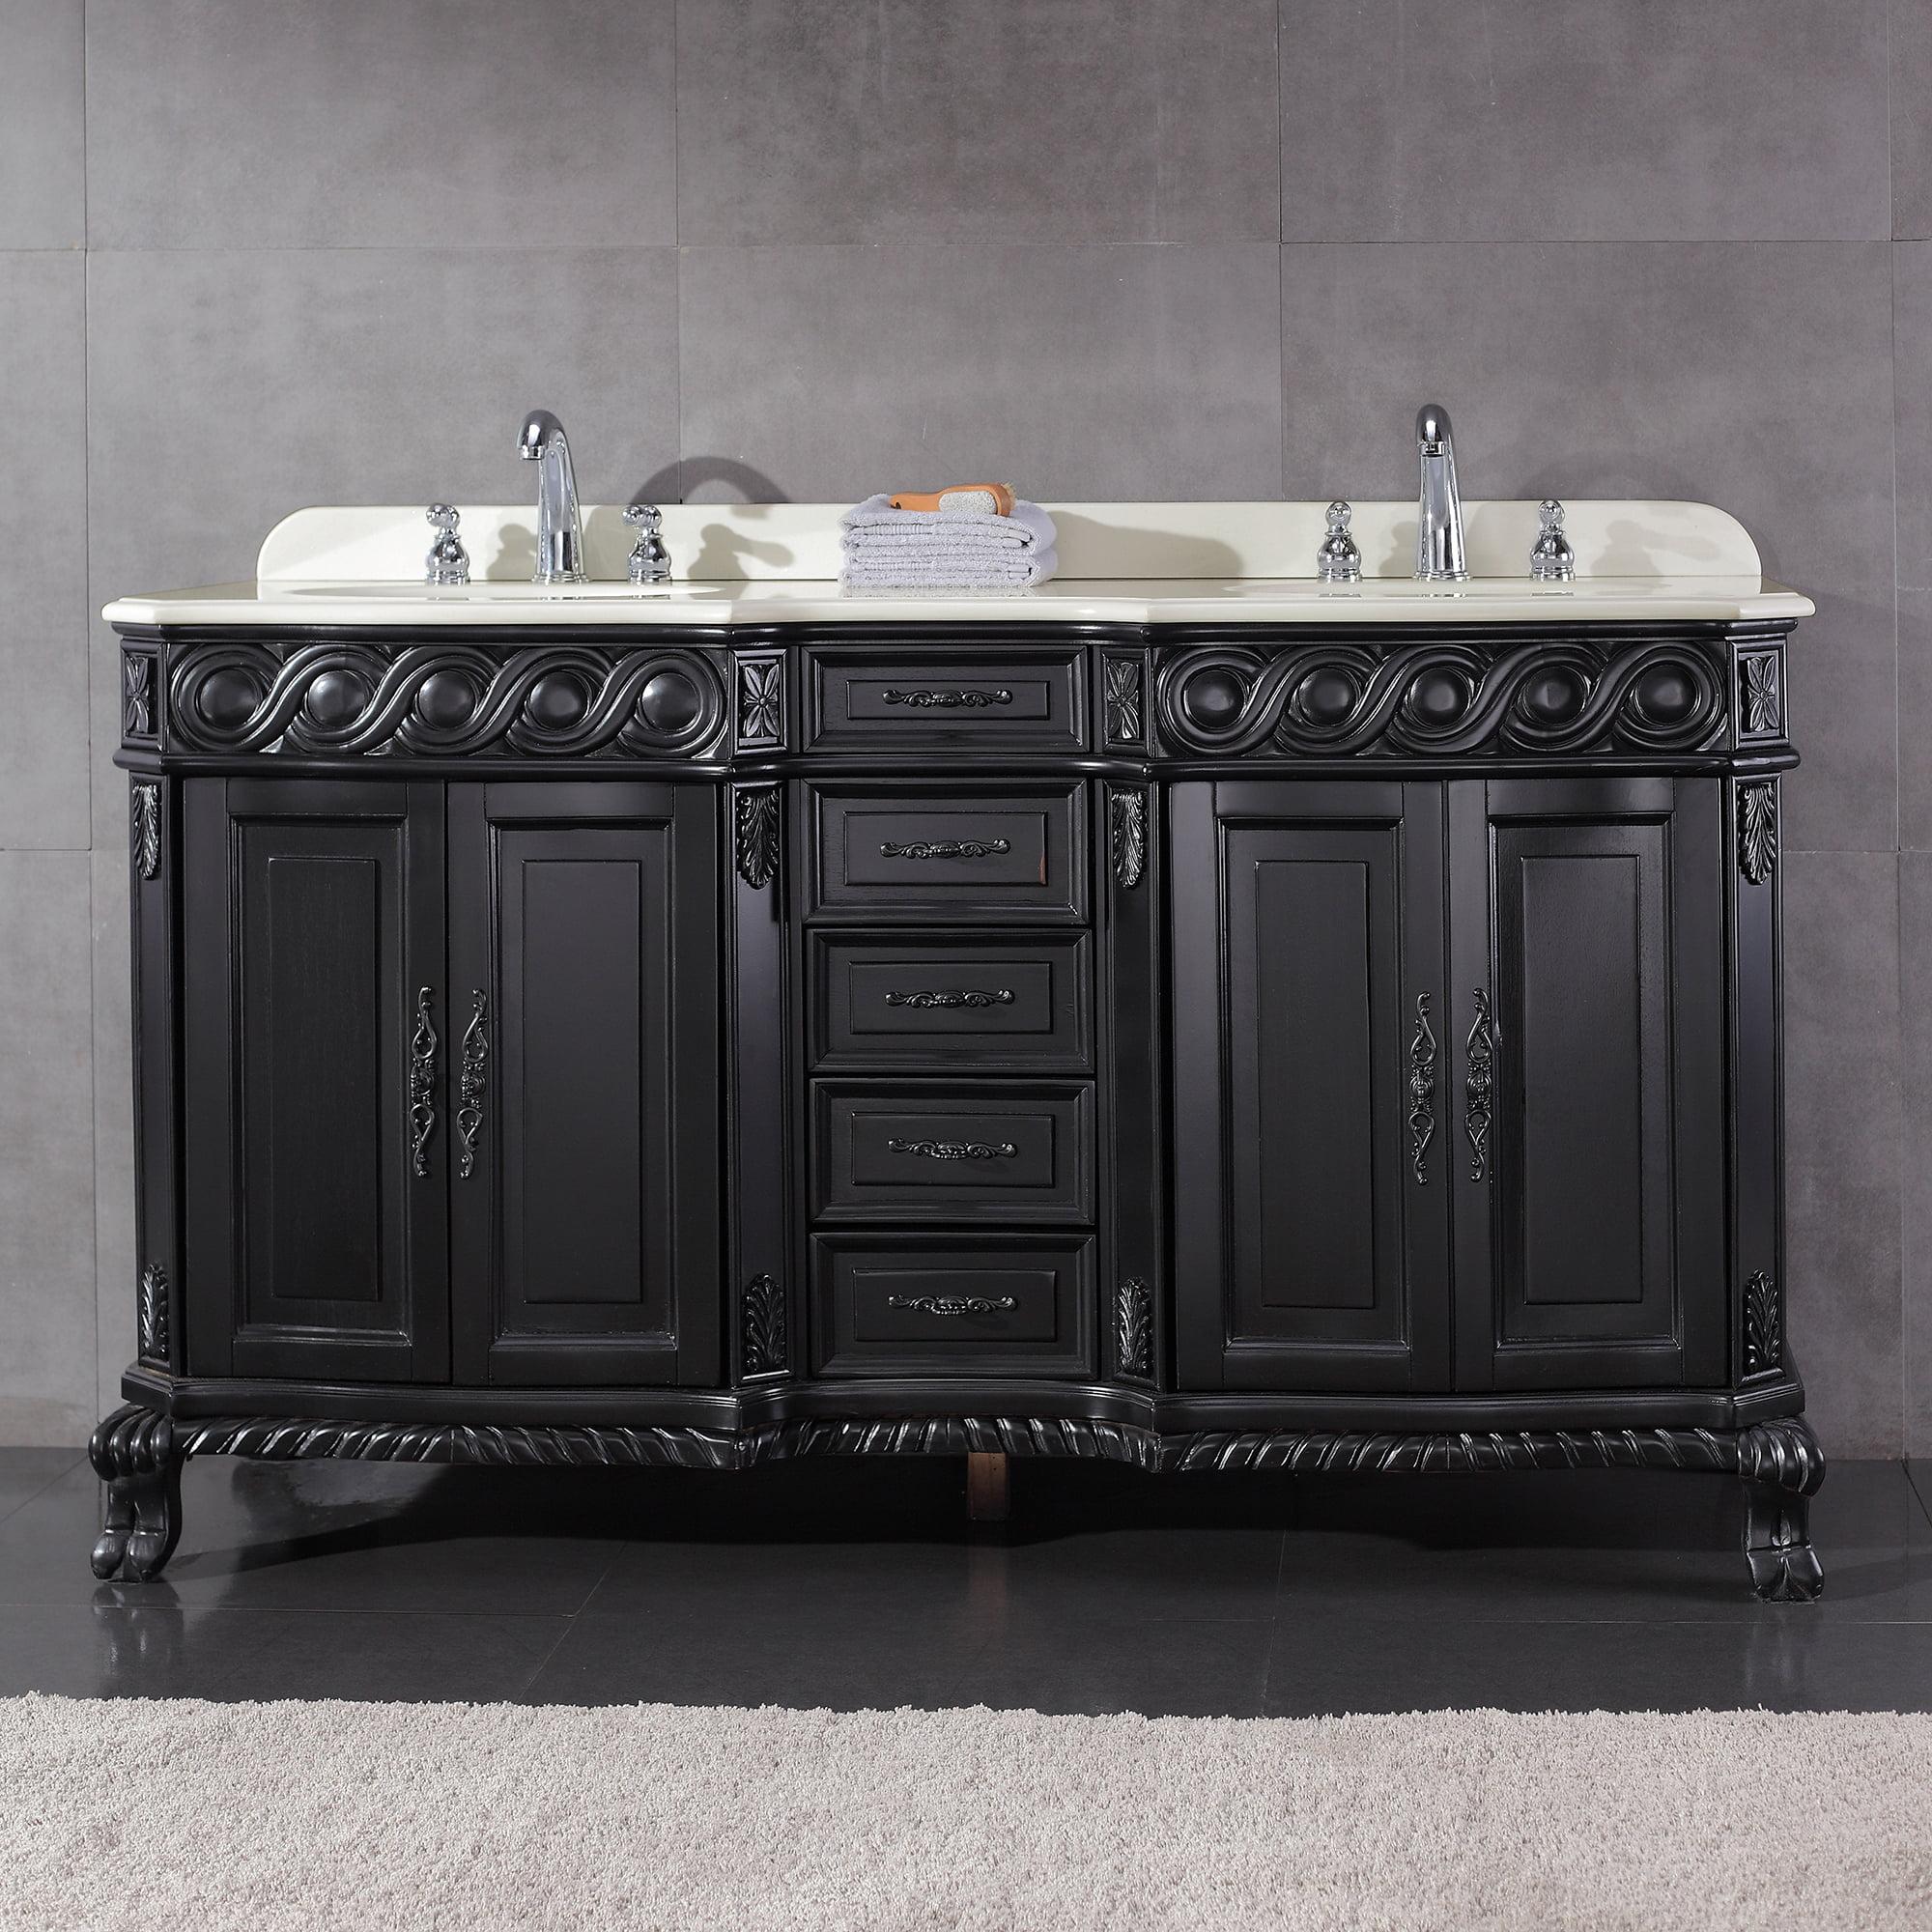 Ove Decors Trent 60 In Antique Black Double Sink Bathroom Vanity With White Cultured Marble Top Walmart Com Walmart Com